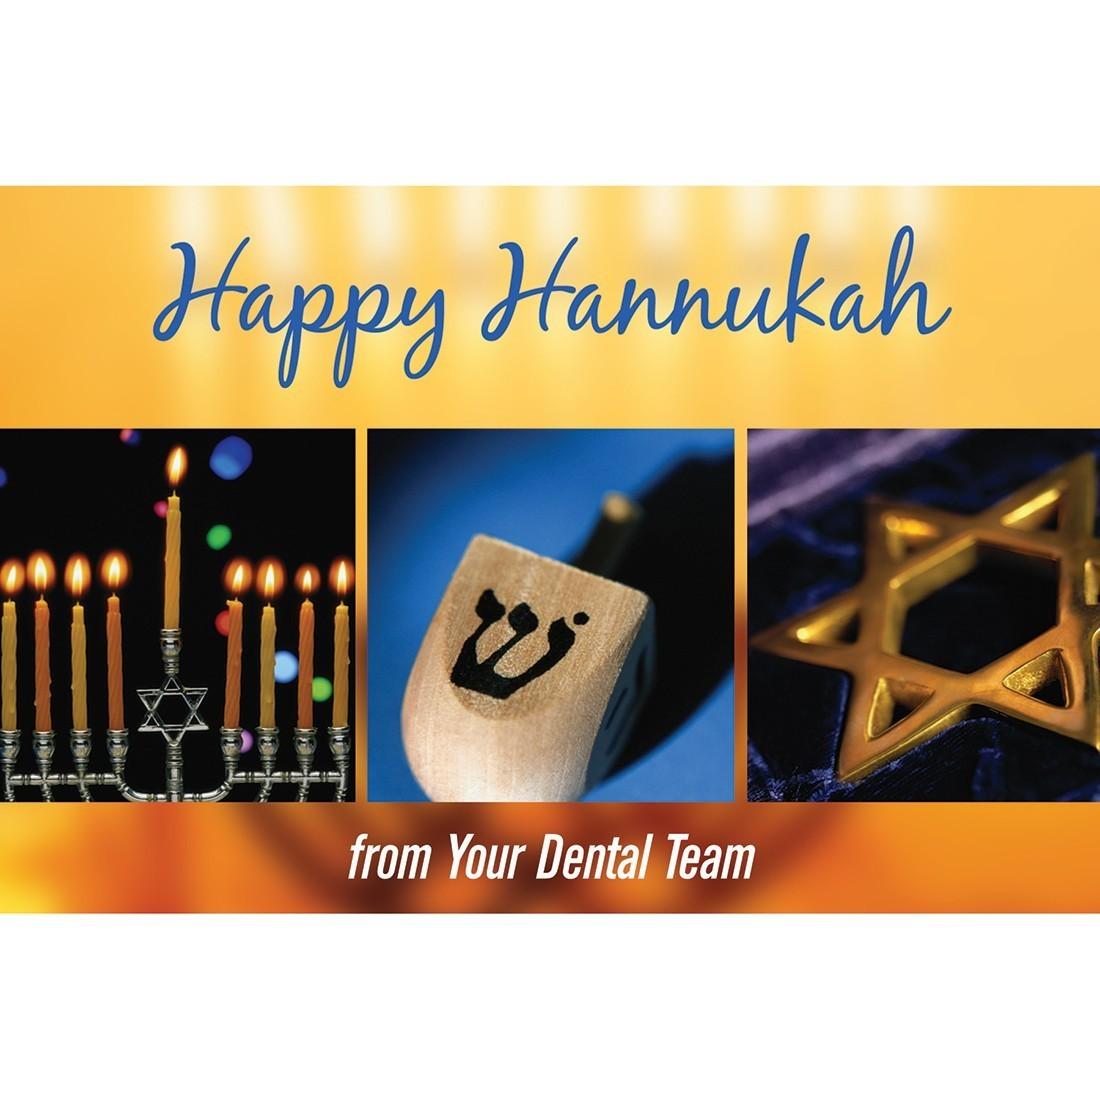 Happy Hanukkah Dental Team Greeting Cards [image]